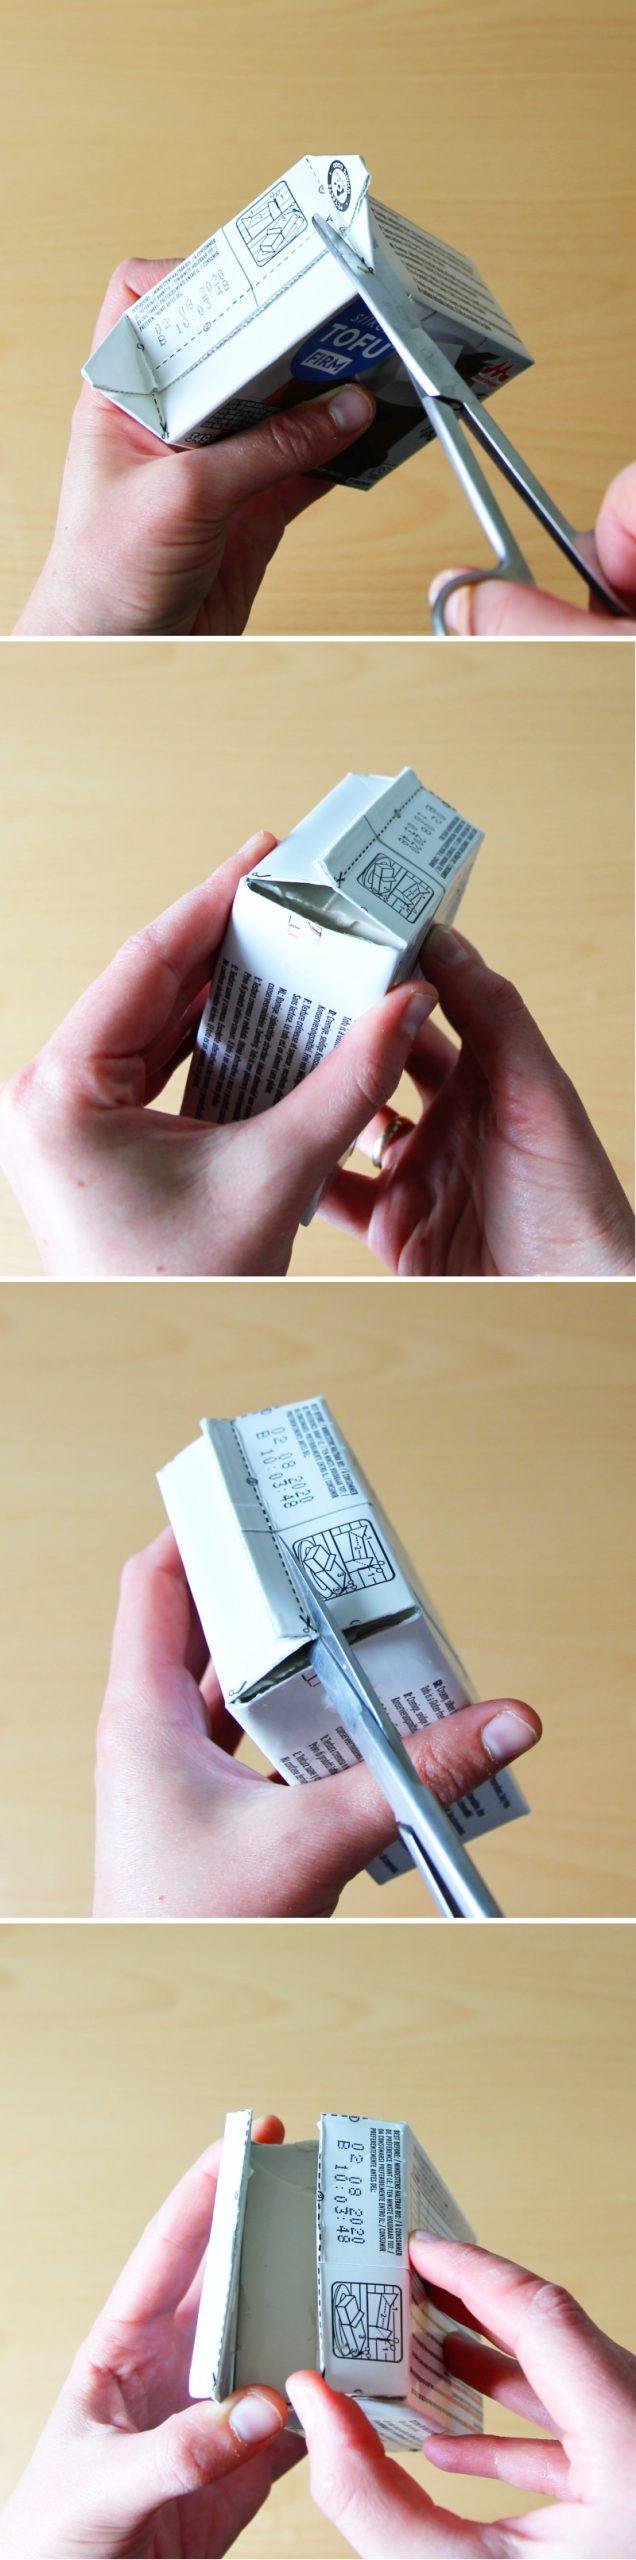 Tofu Verpackung öffnen Schritt 2